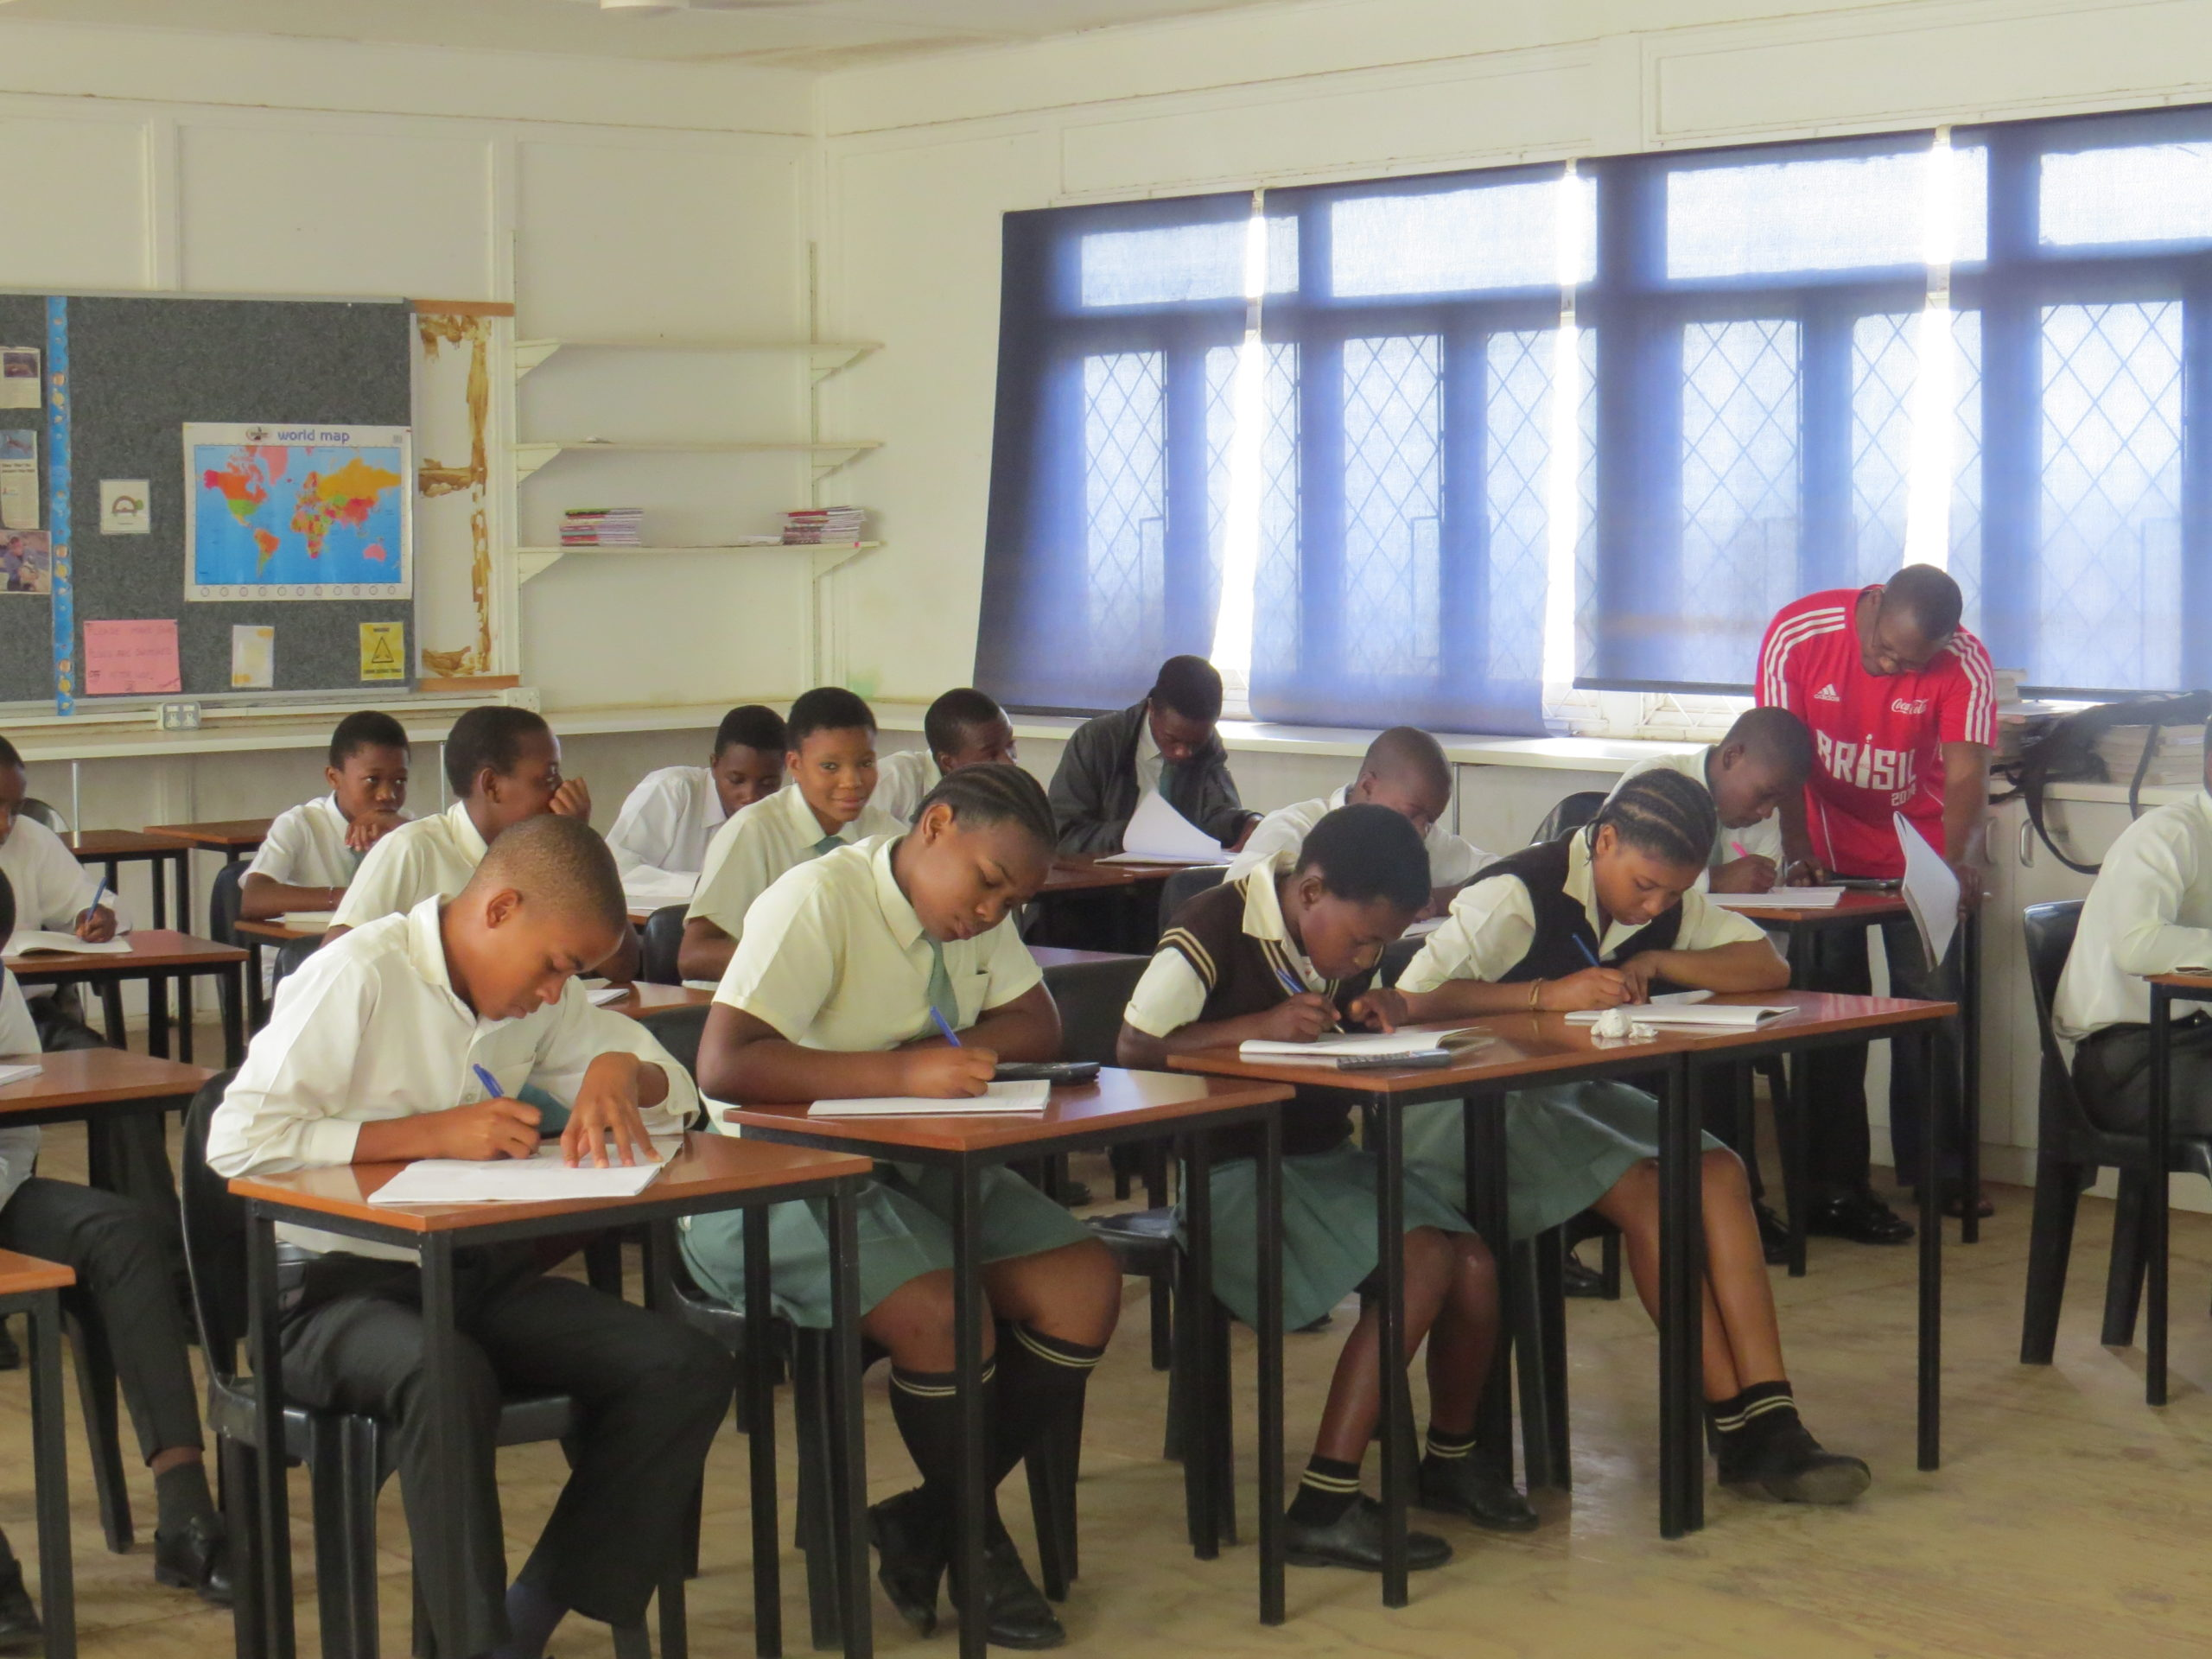 South_Africa_2016_susan_valiquette_inanda_school_01.jpeg